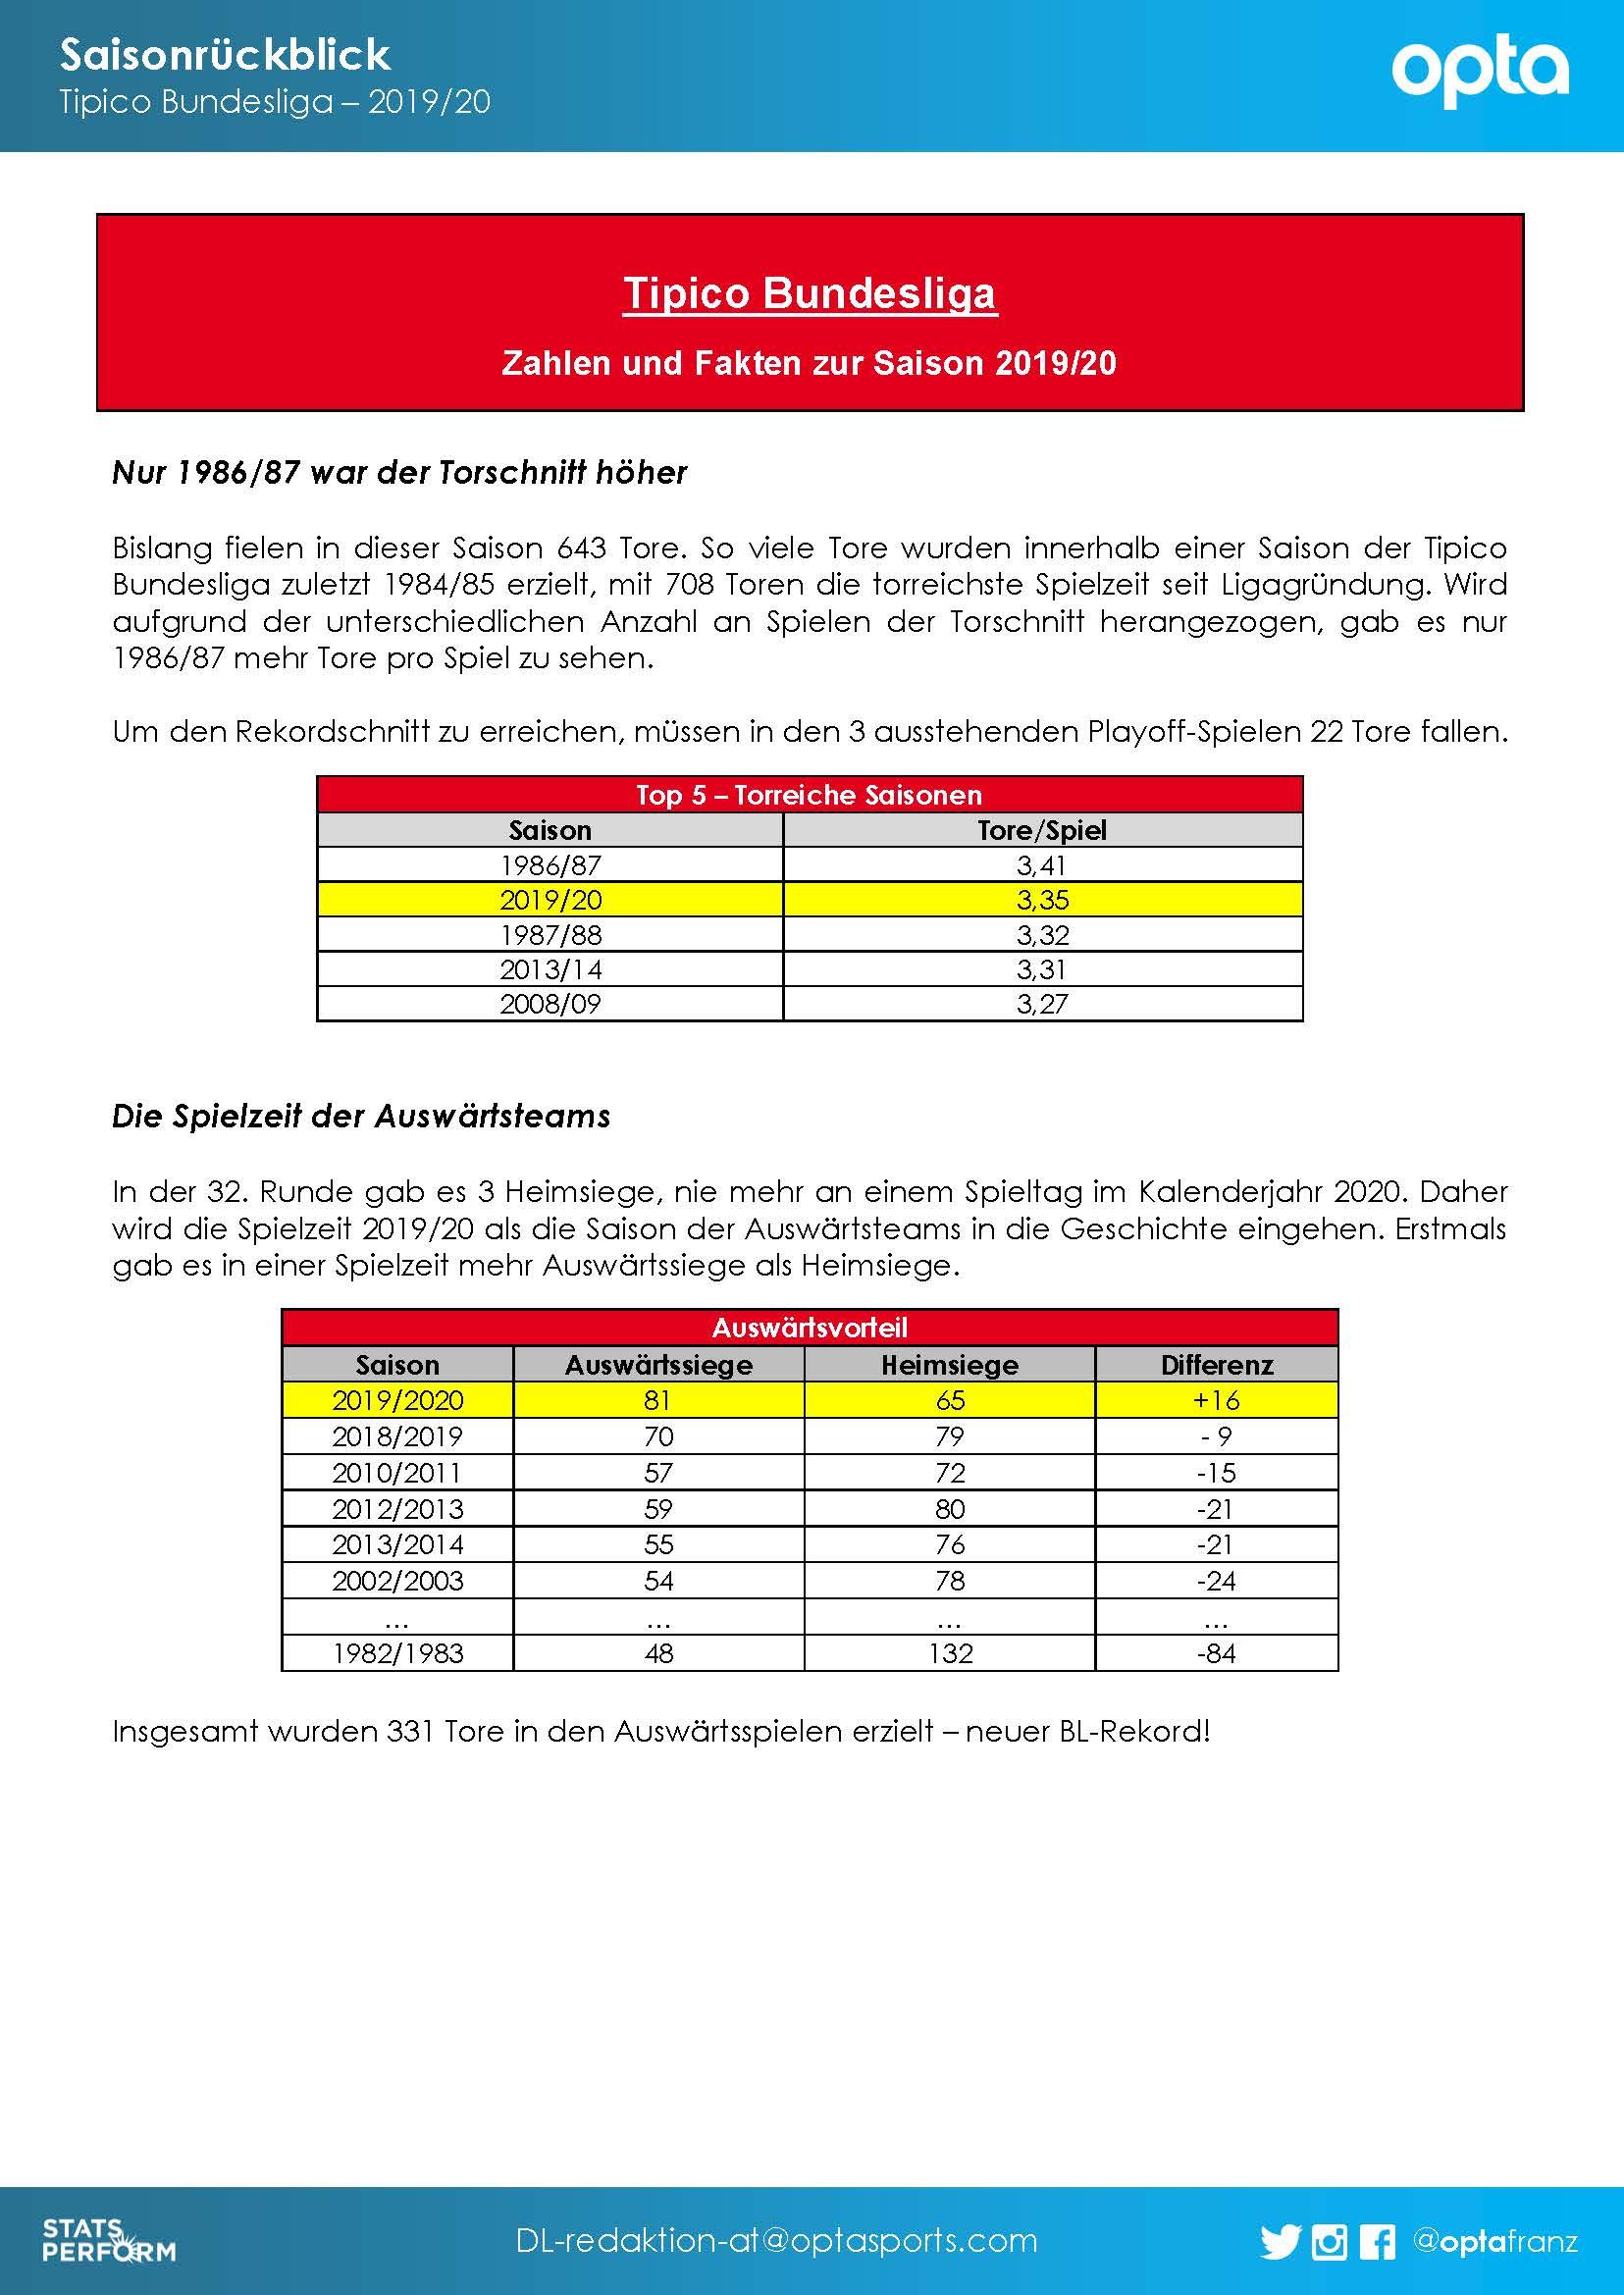 (c) Tipico Bundesliga